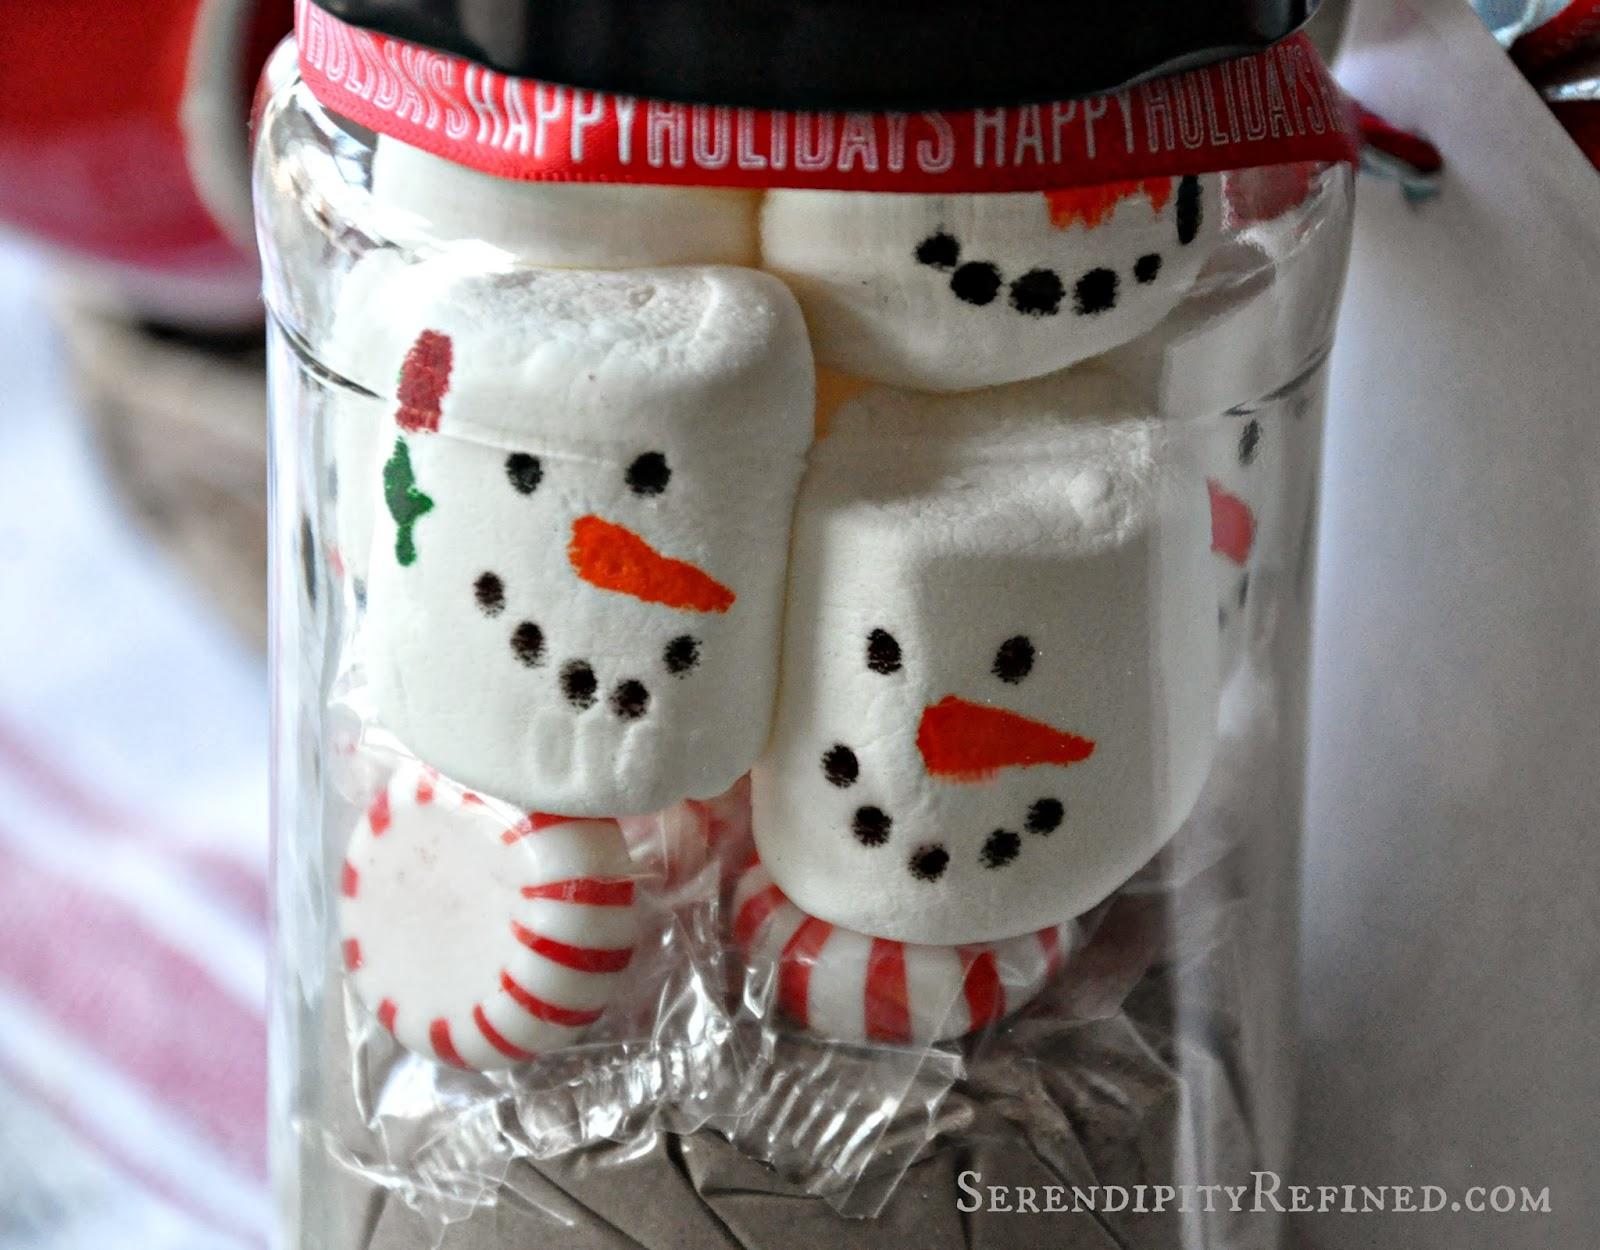 Serendipity Refined Blog: Christmas Mason Jar Hot Cocoa Gift and ...